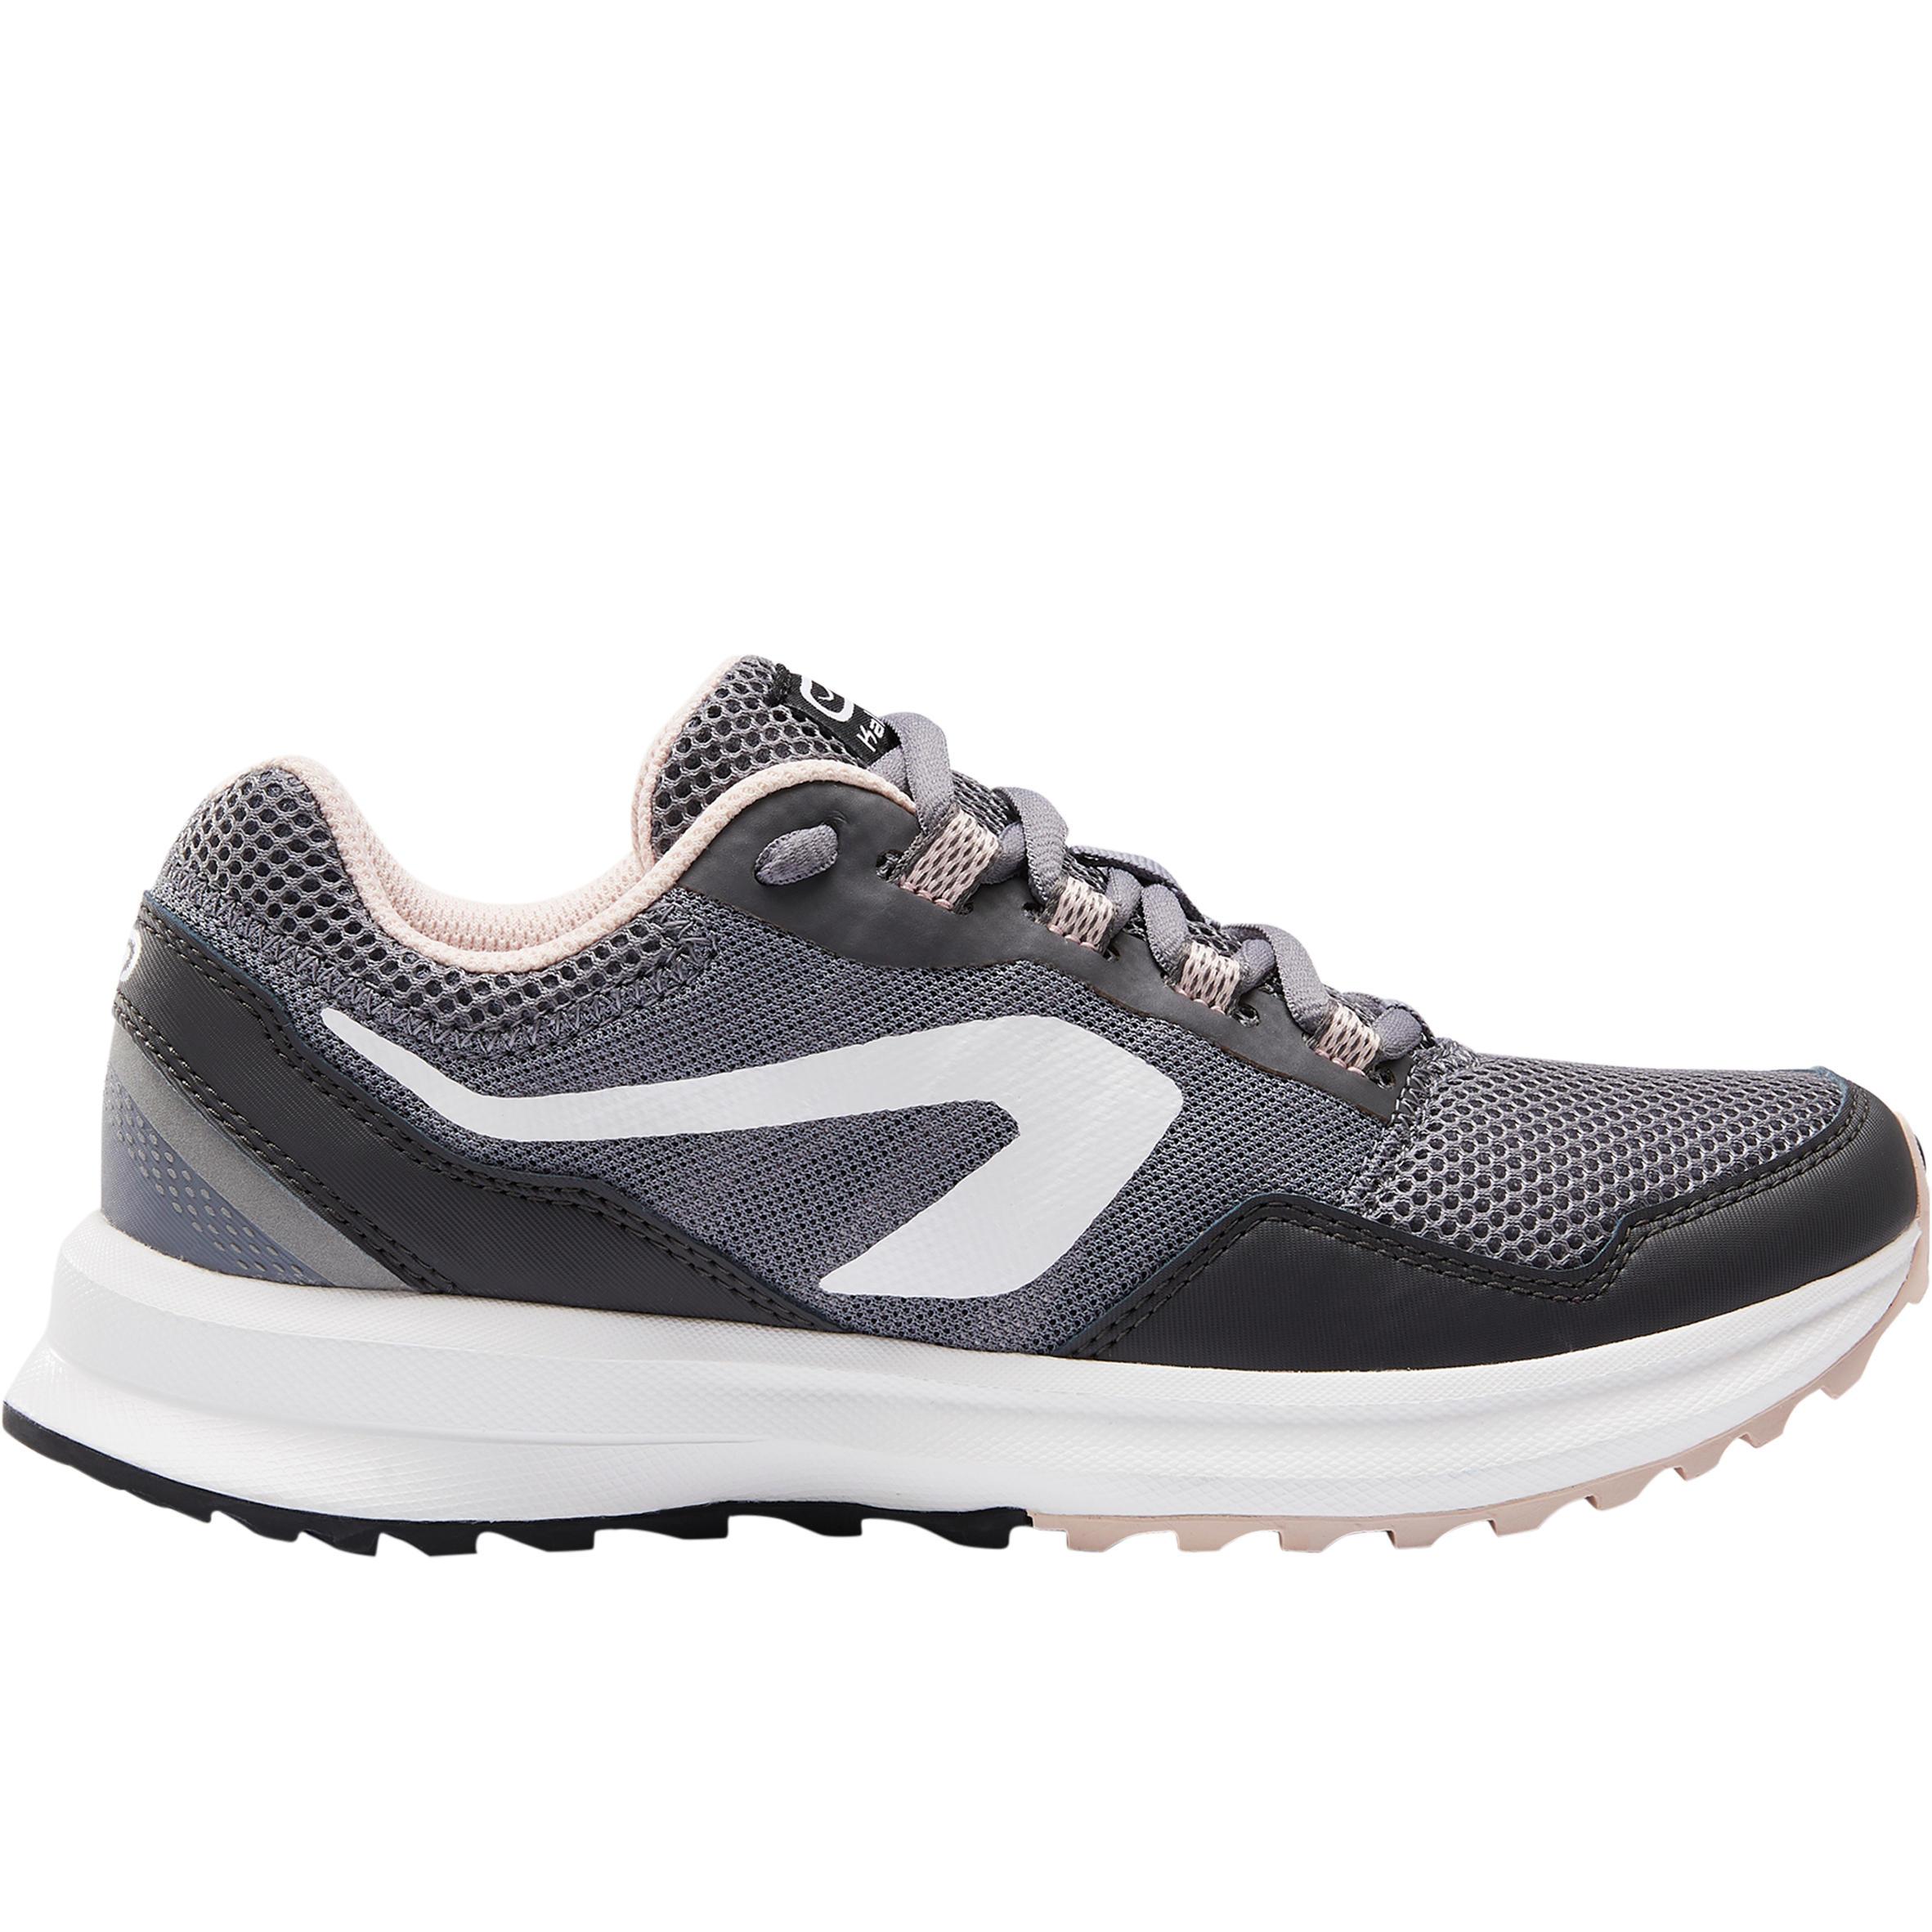 Run Active Grip Women's Jogging Shoes